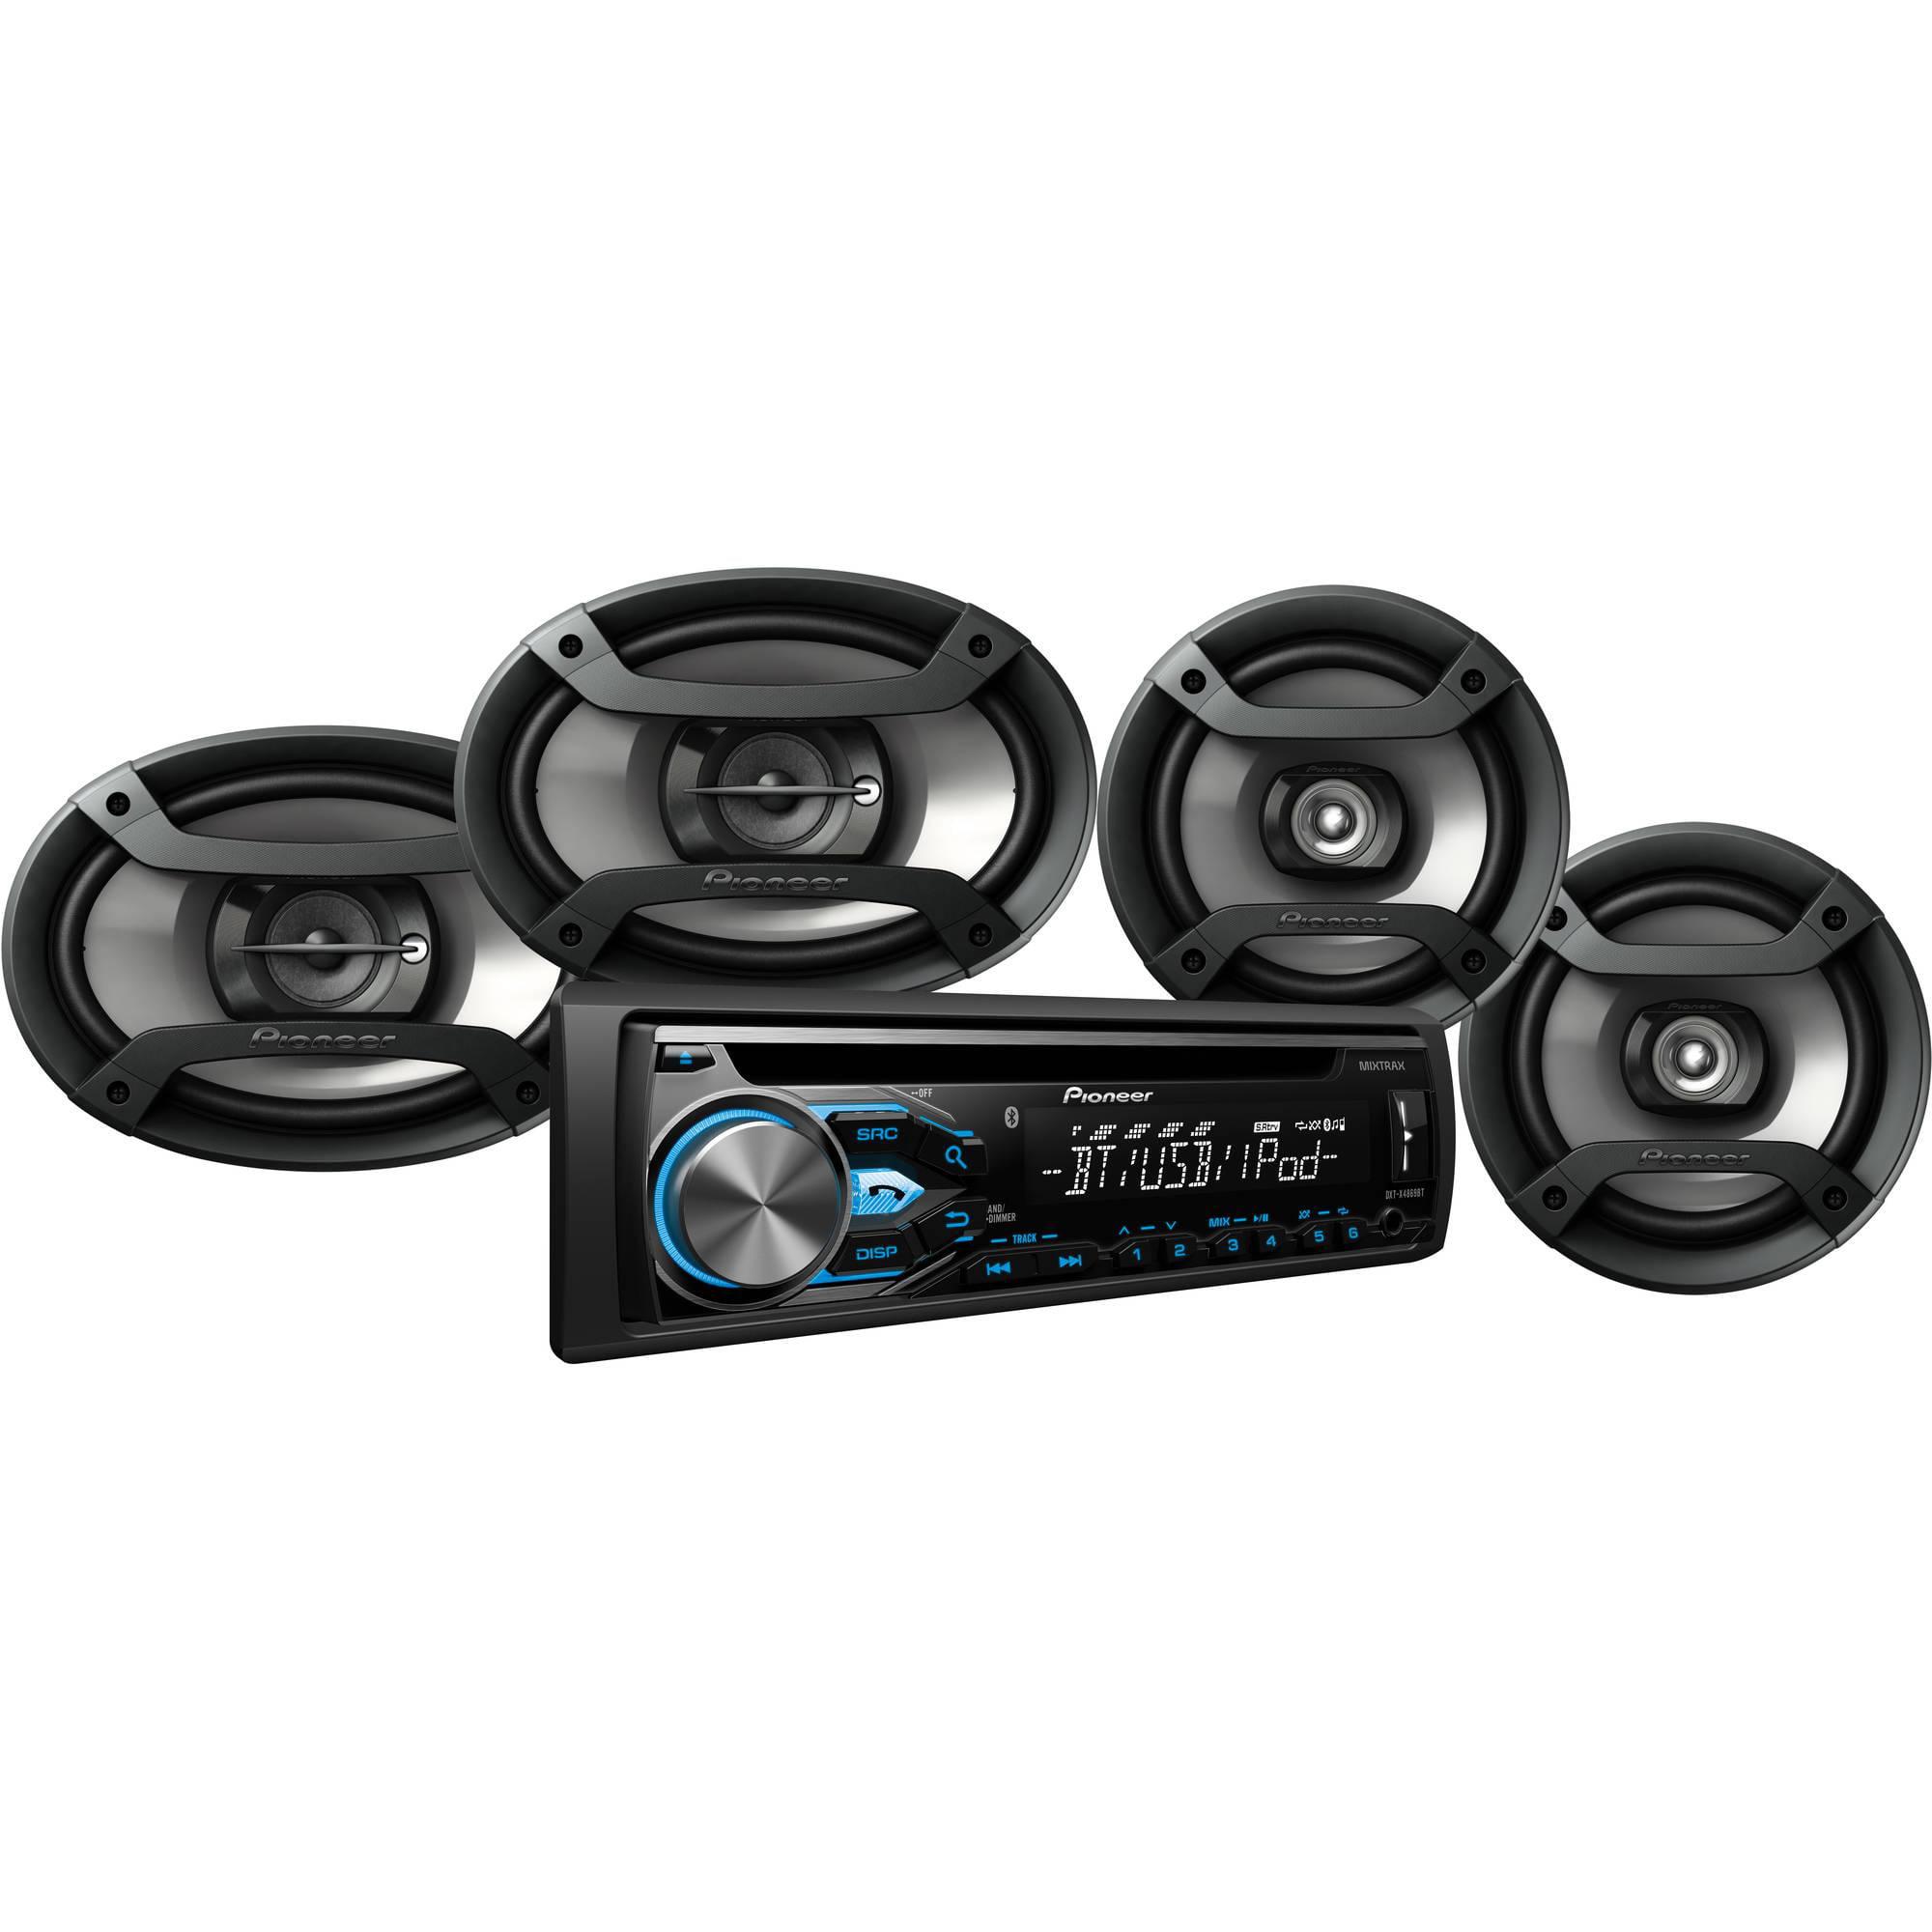 Refurbished Pioneer DXT-X4869BT Bluetooth CD Car Stereo Receiver Bundle